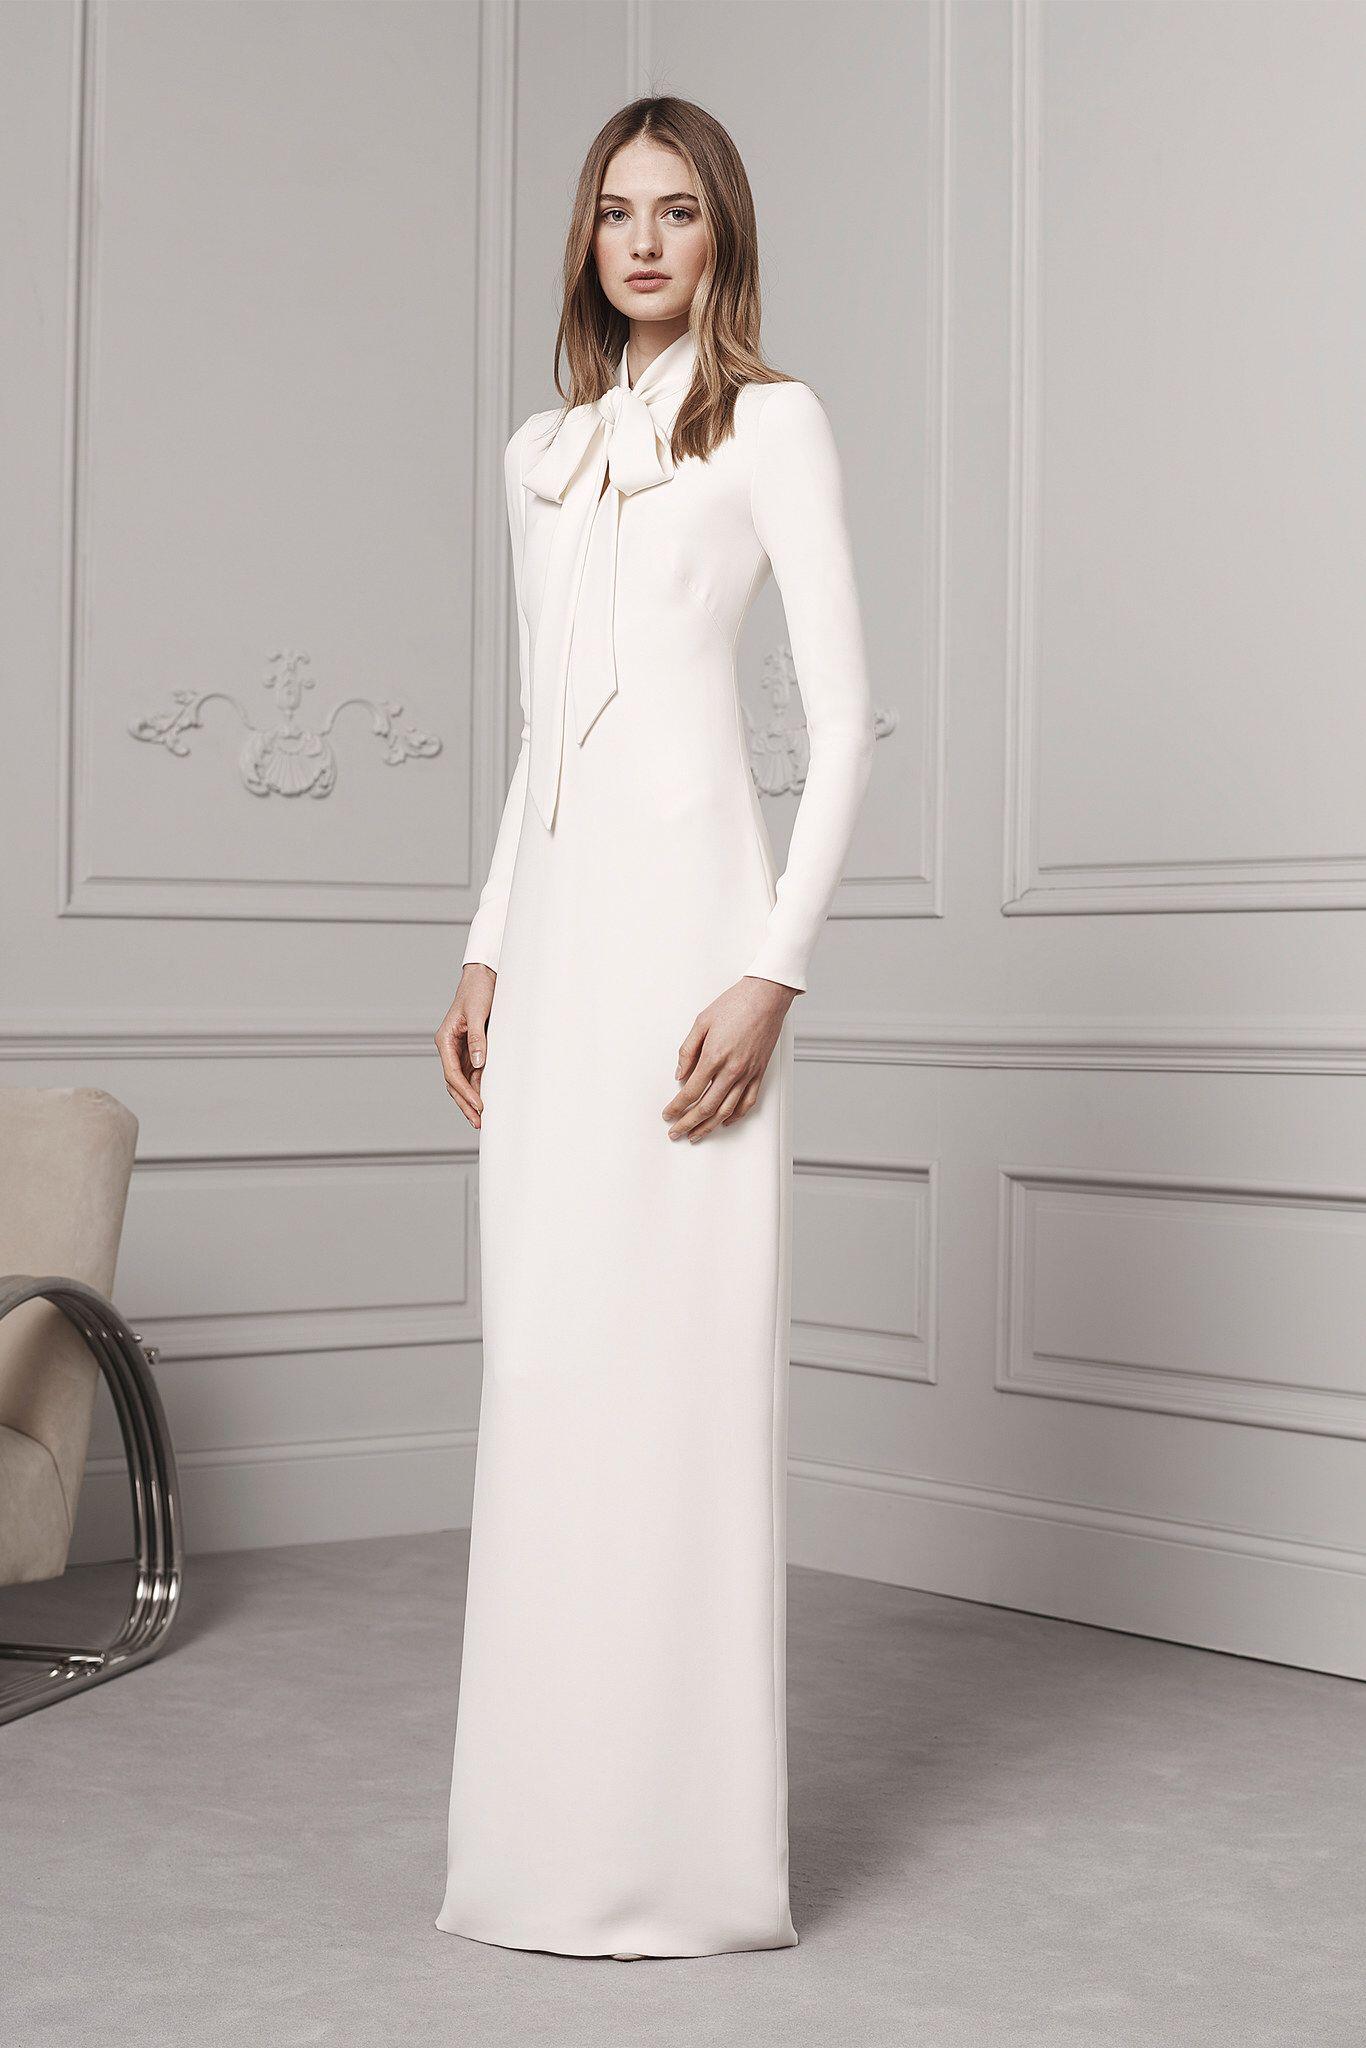 Ralph Lauren Pre-Fall 2016 Fashion Show   Fall 2016, Casual formal ...